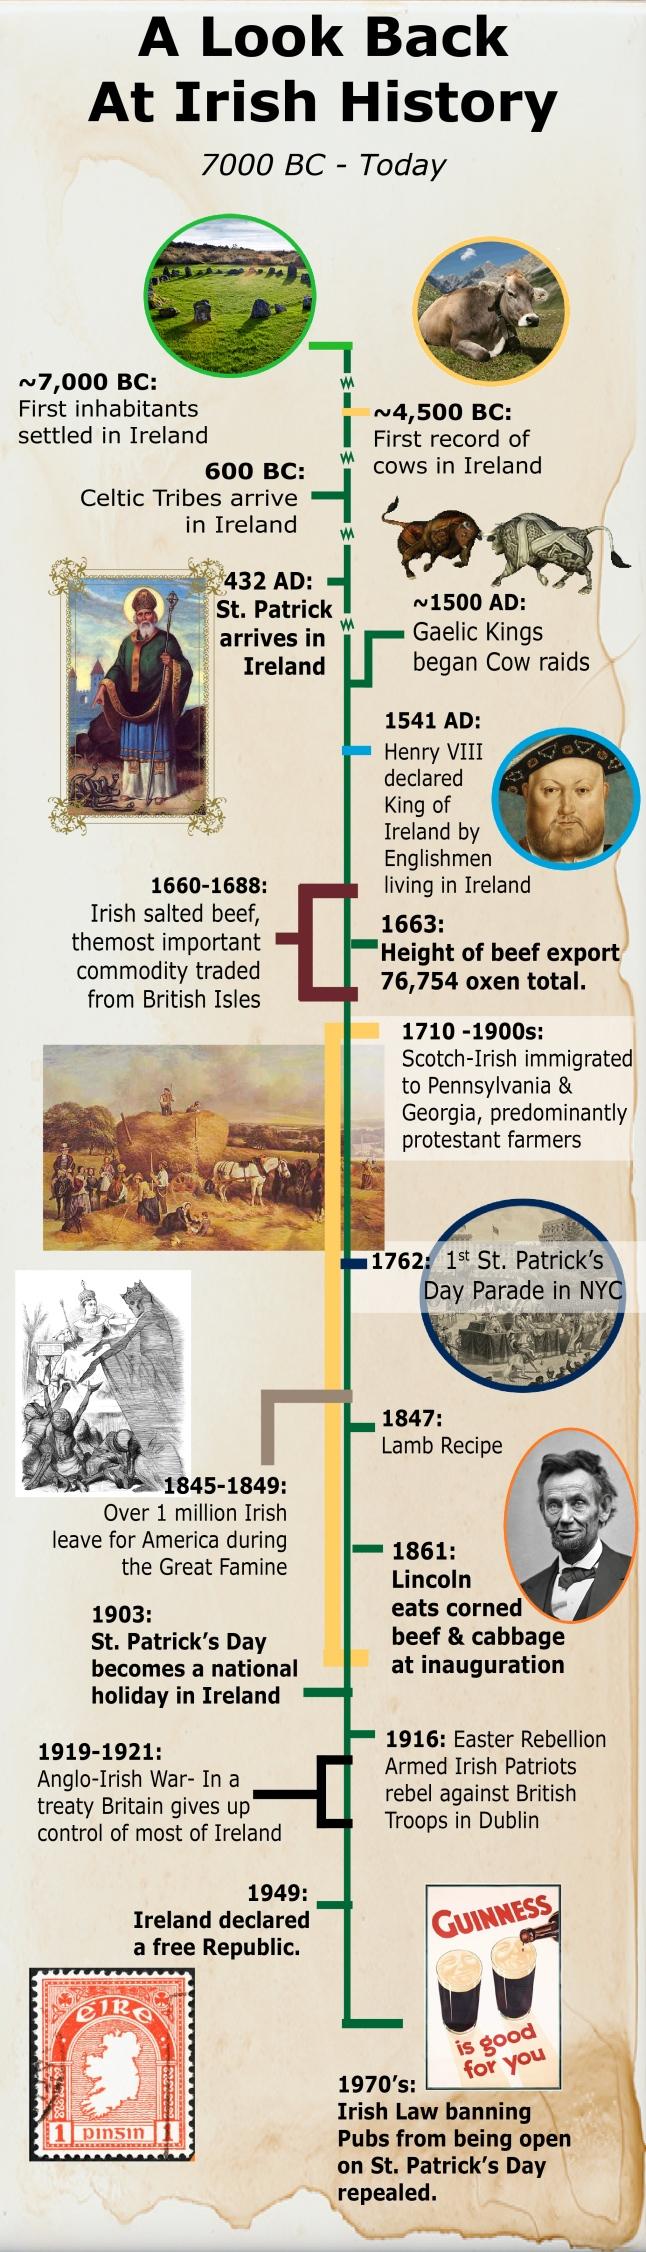 irish-history-timeline